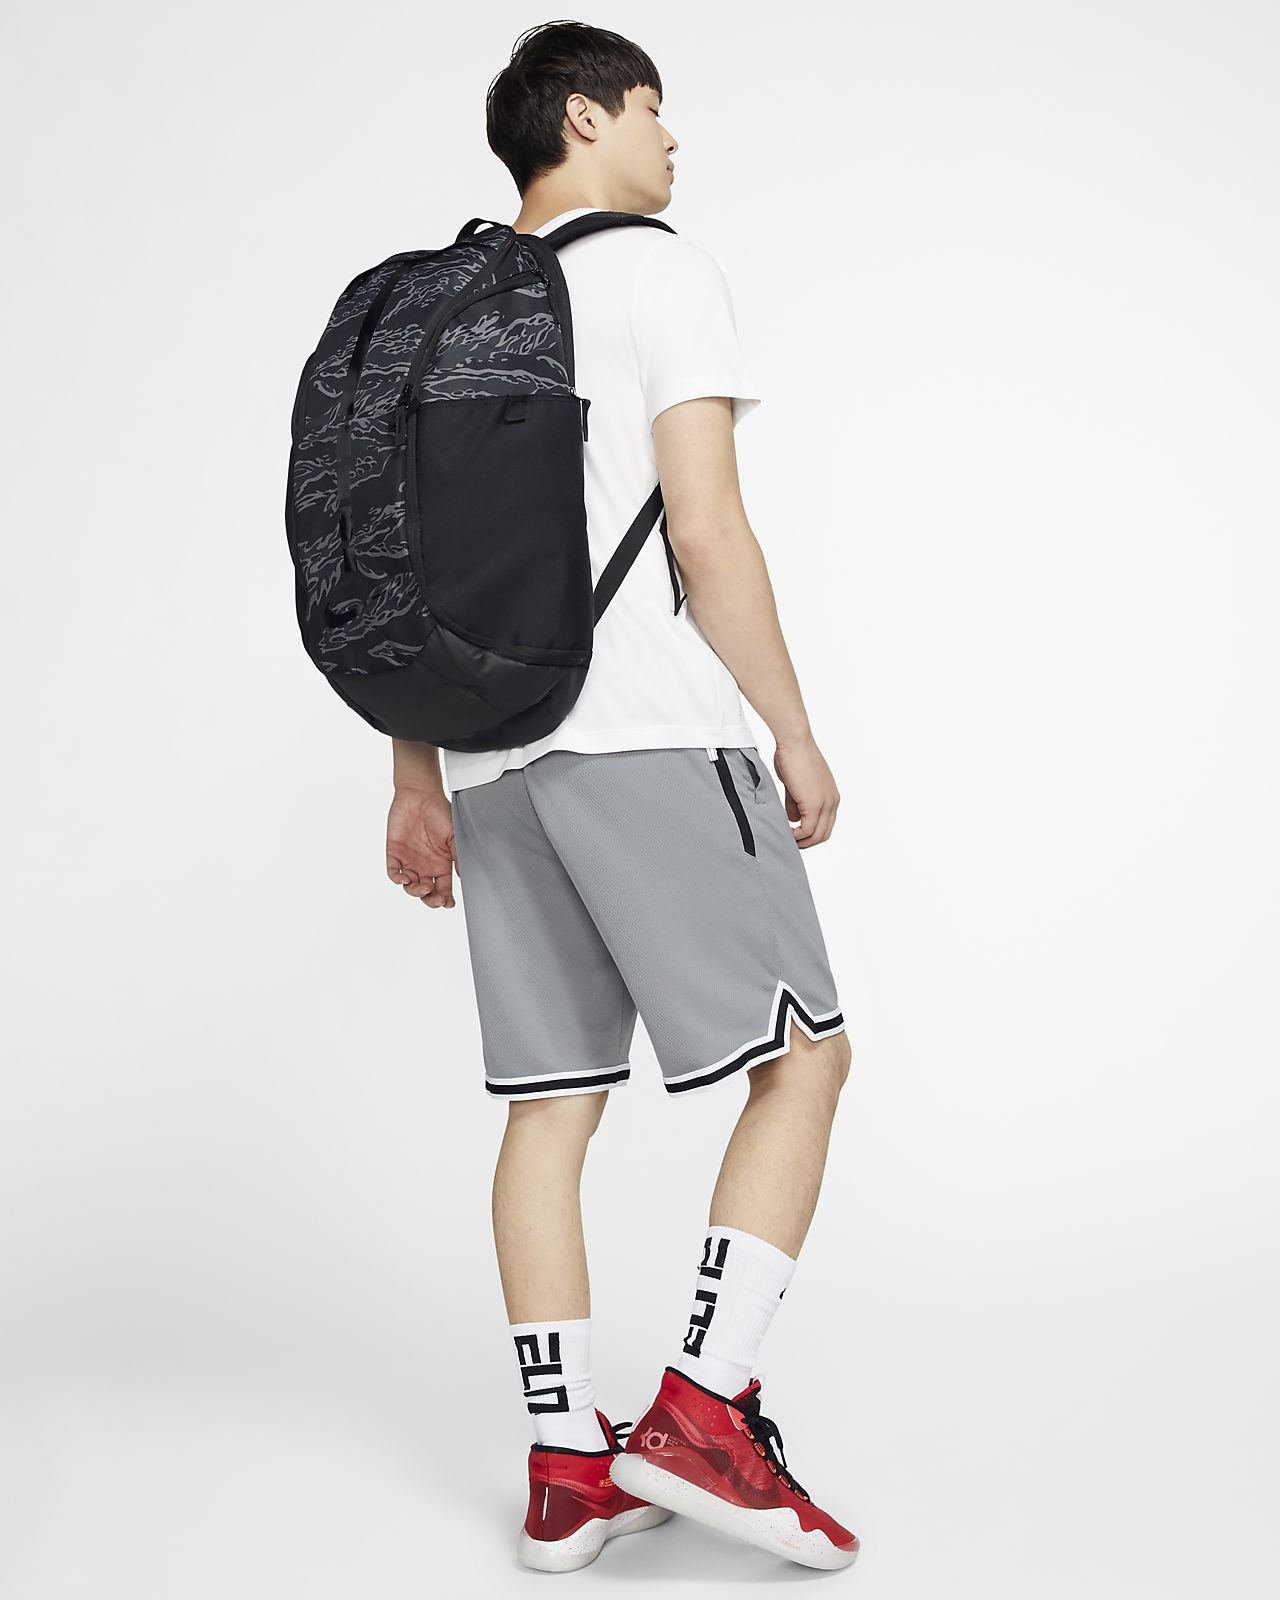 Nike Hoops Elite Pro Basketball Backpack (Small)